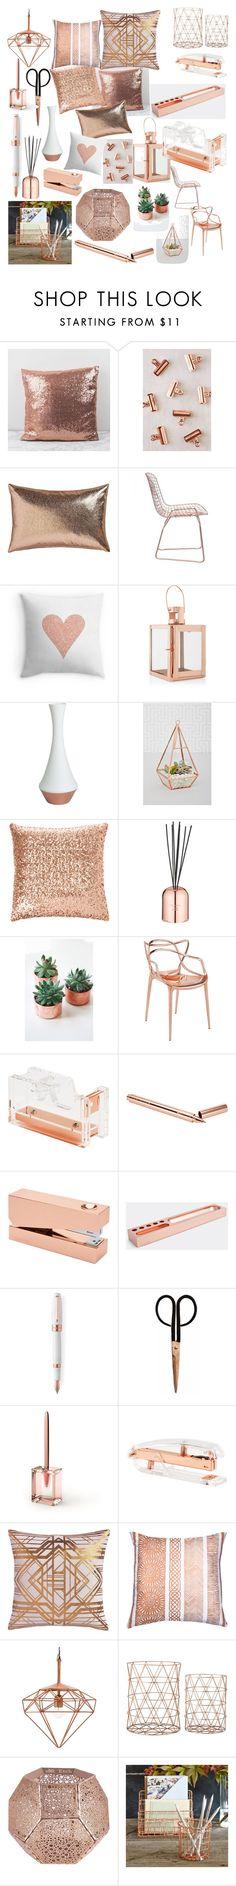 New room decor urban pillows ideas Rose Gold Rooms, Rose Gold Decor, Gray Decor, Gold Bedroom, Bedroom Decor, Bedroom Ideas, Bedroom Furniture, Copper Bedroom, Living Furniture